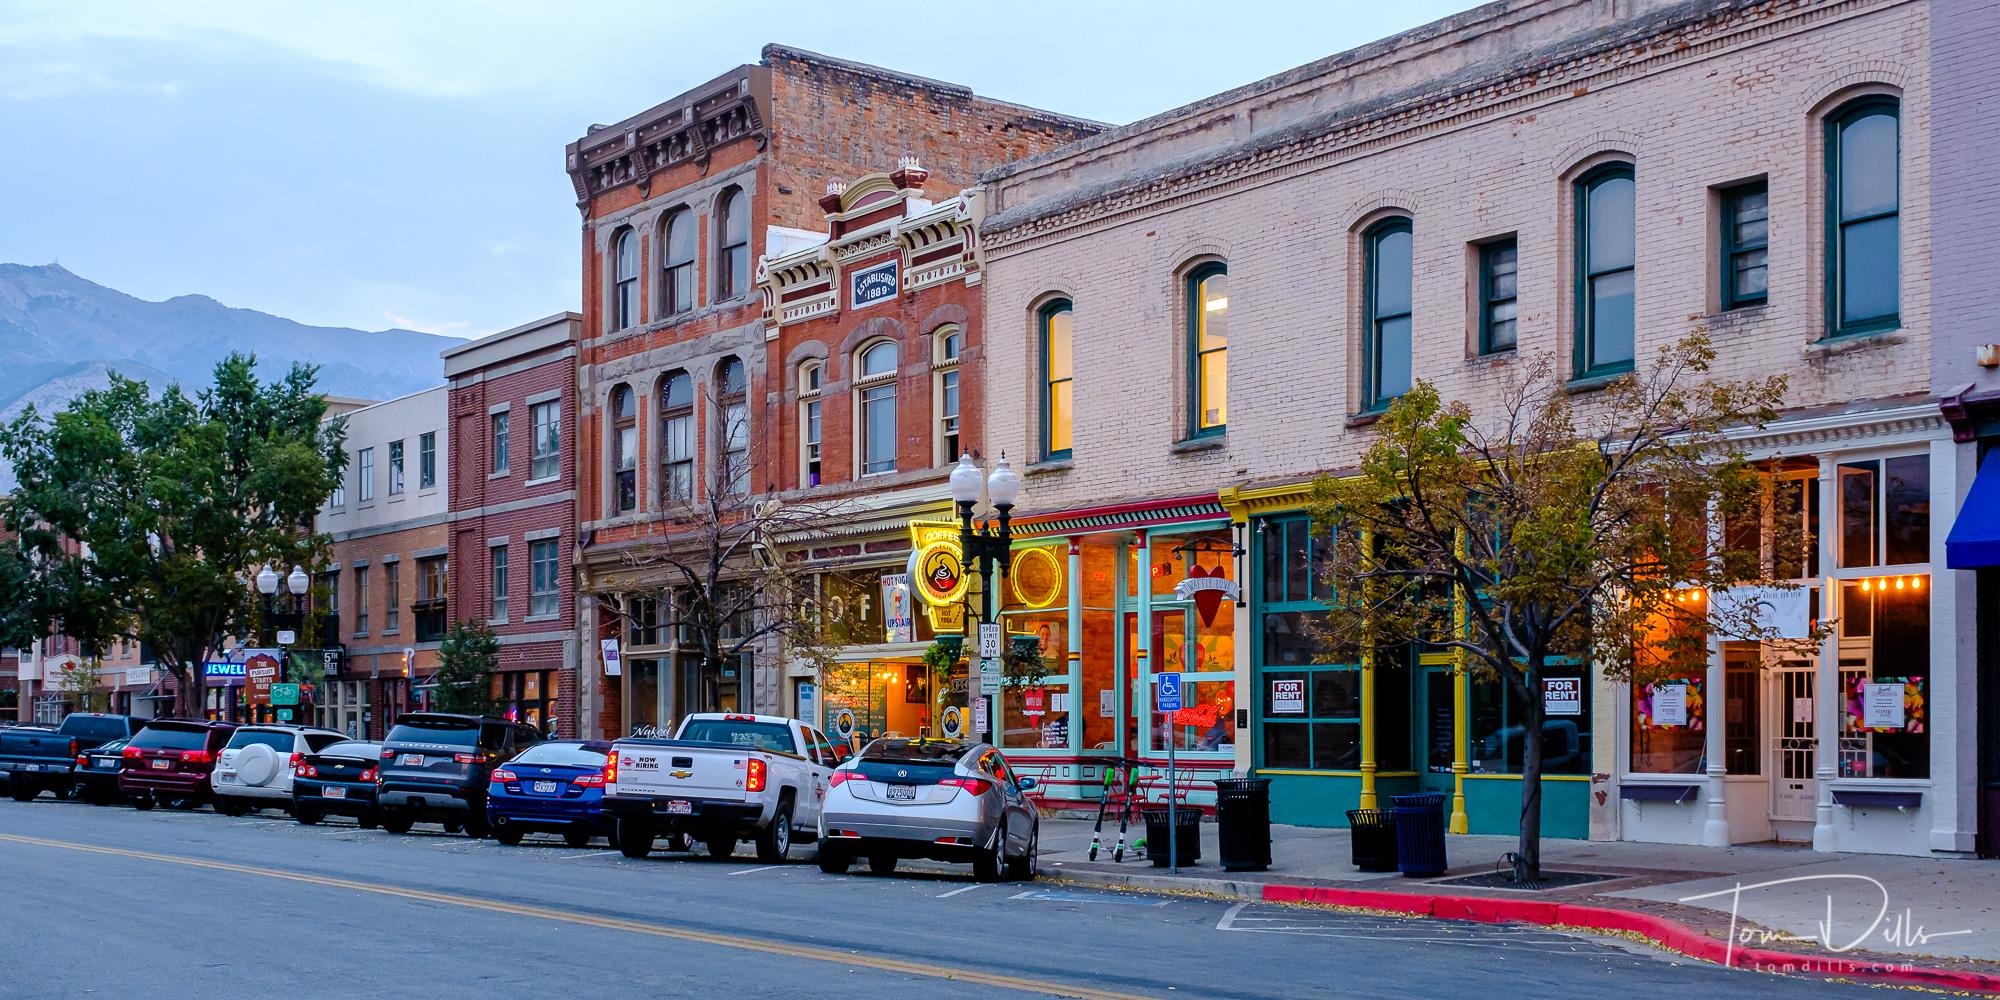 Evening in downtown Ogden, Utah